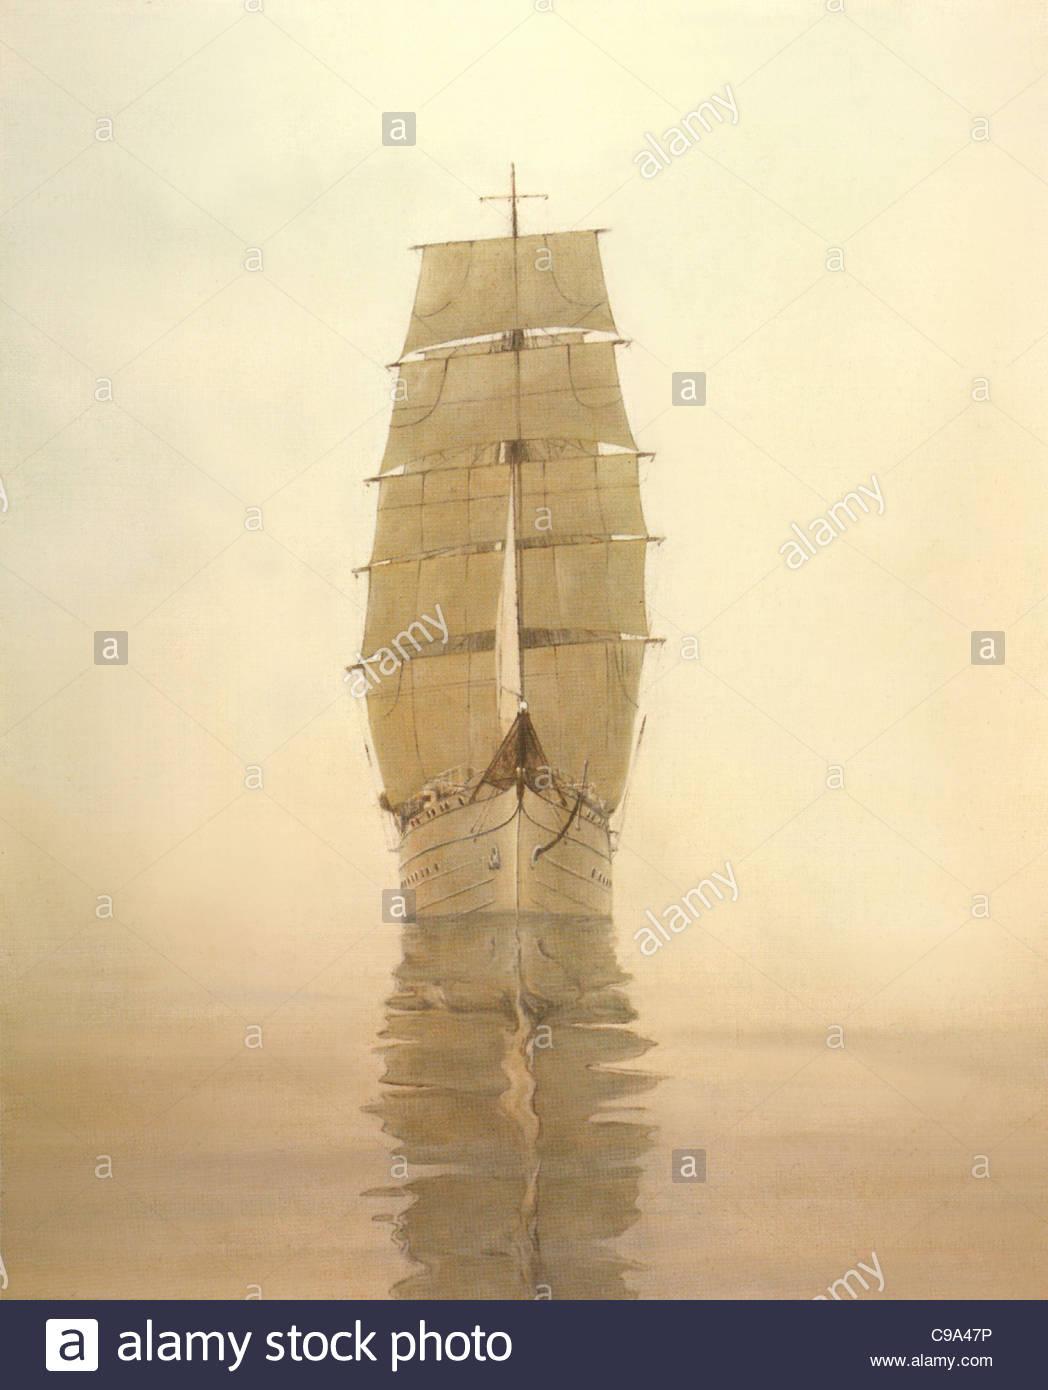 Sail training ship Gorch Foresail (I) - Stock Image